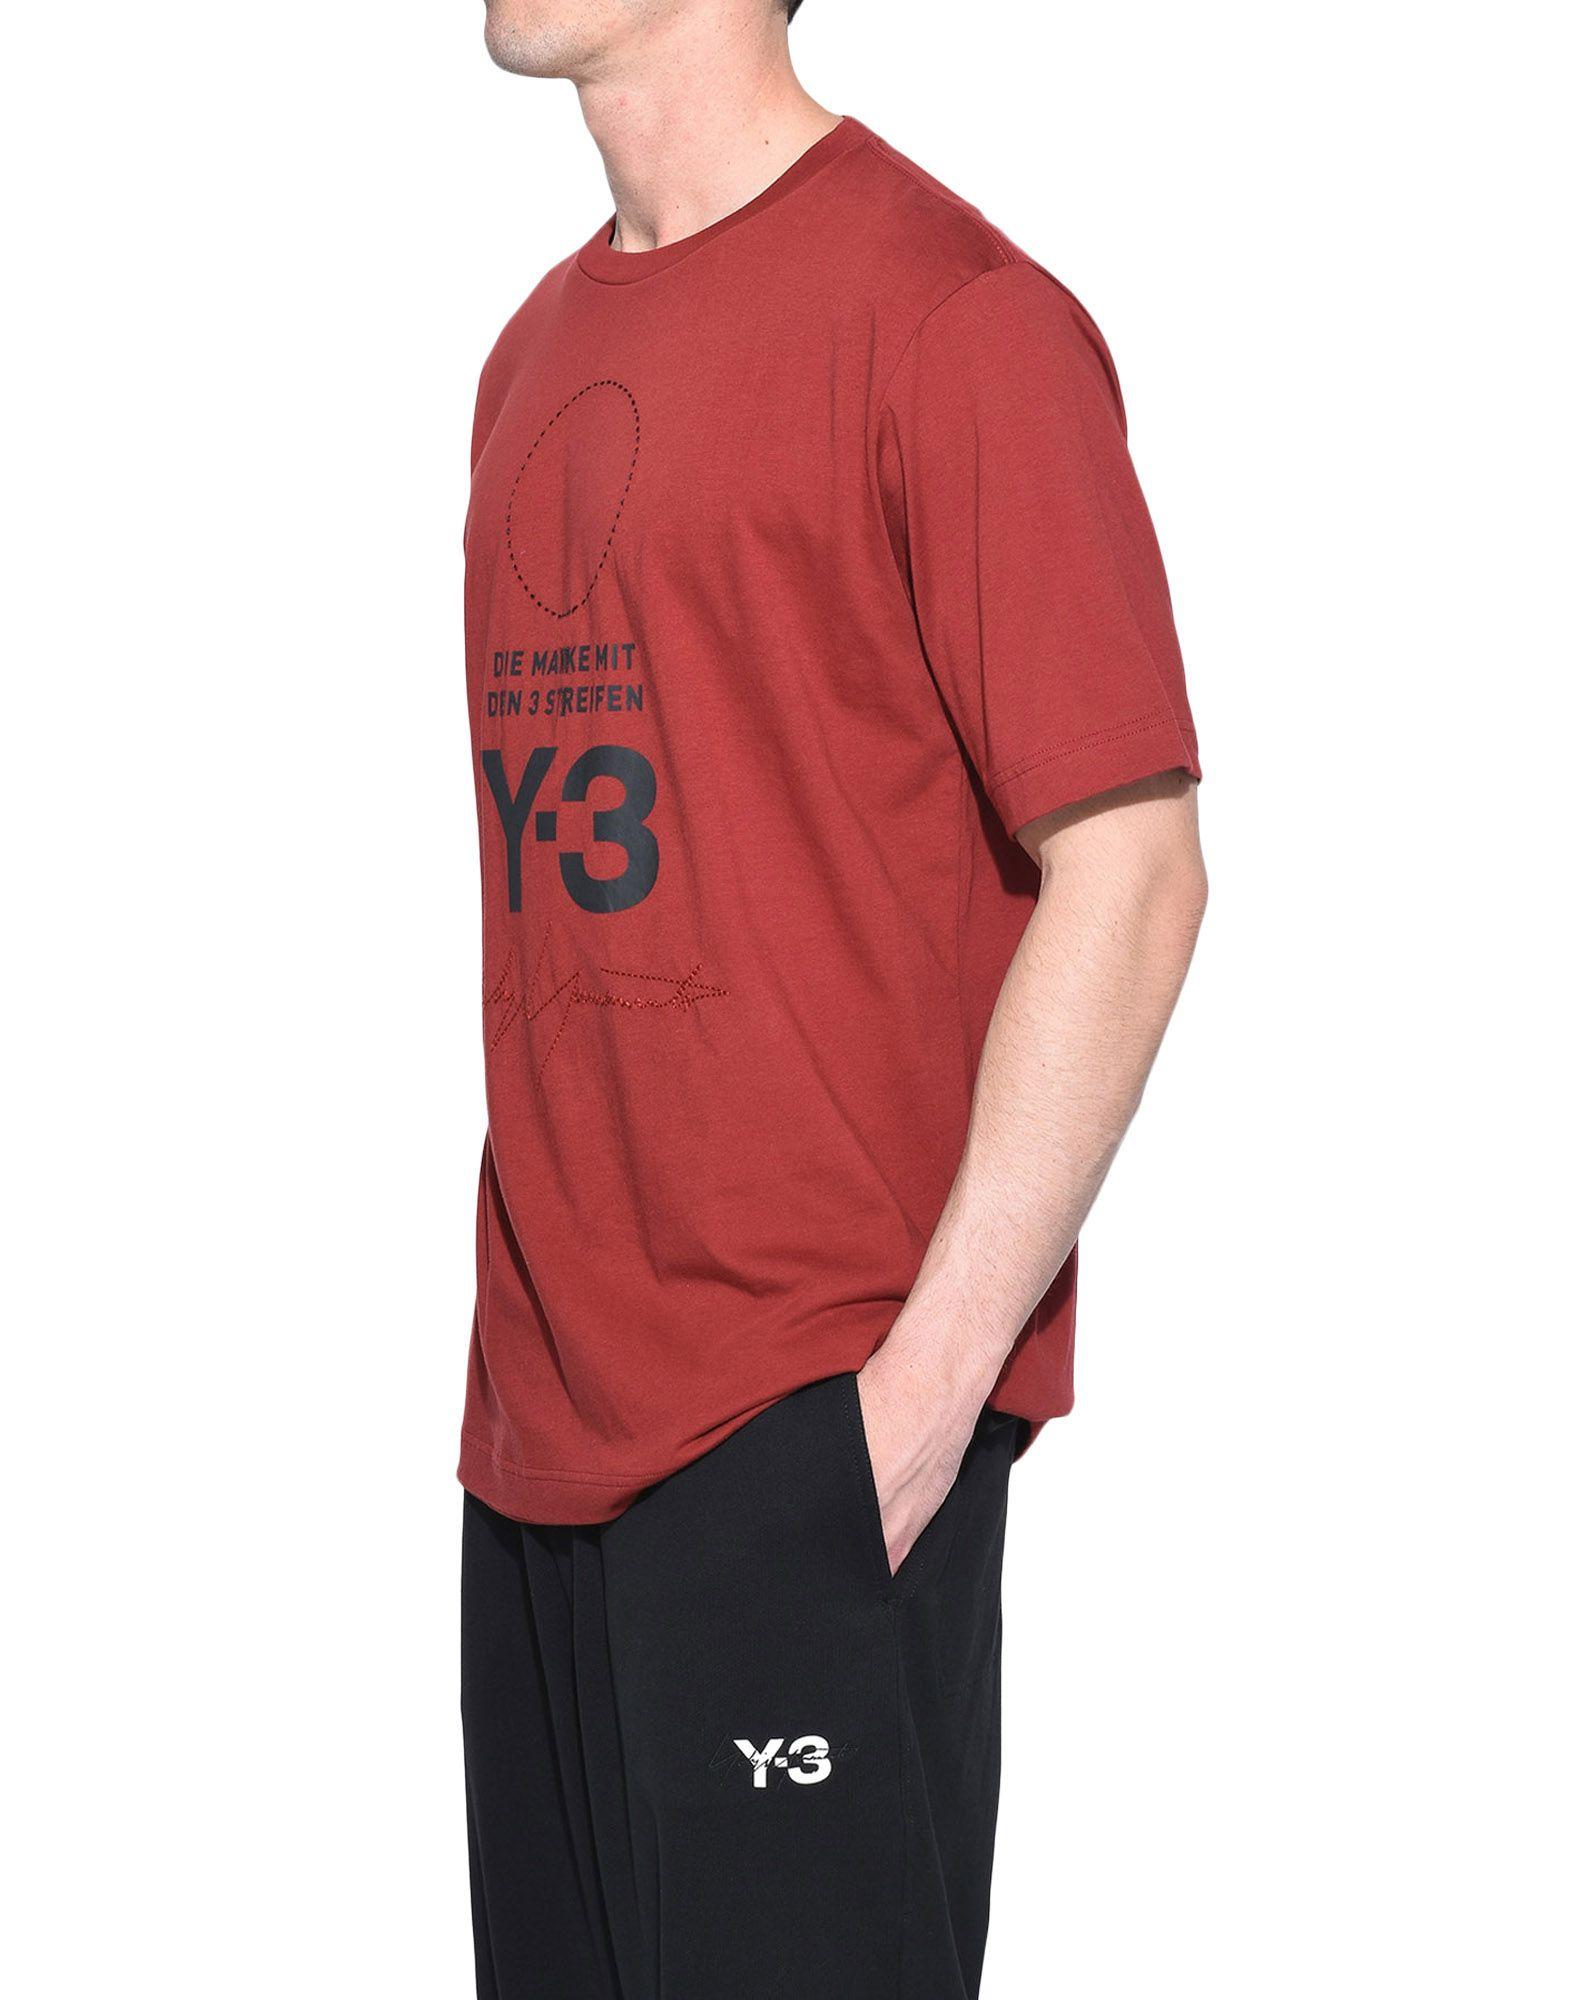 Y-3 Y-3 Stacked Logo Tee Short sleeve t-shirt Man e